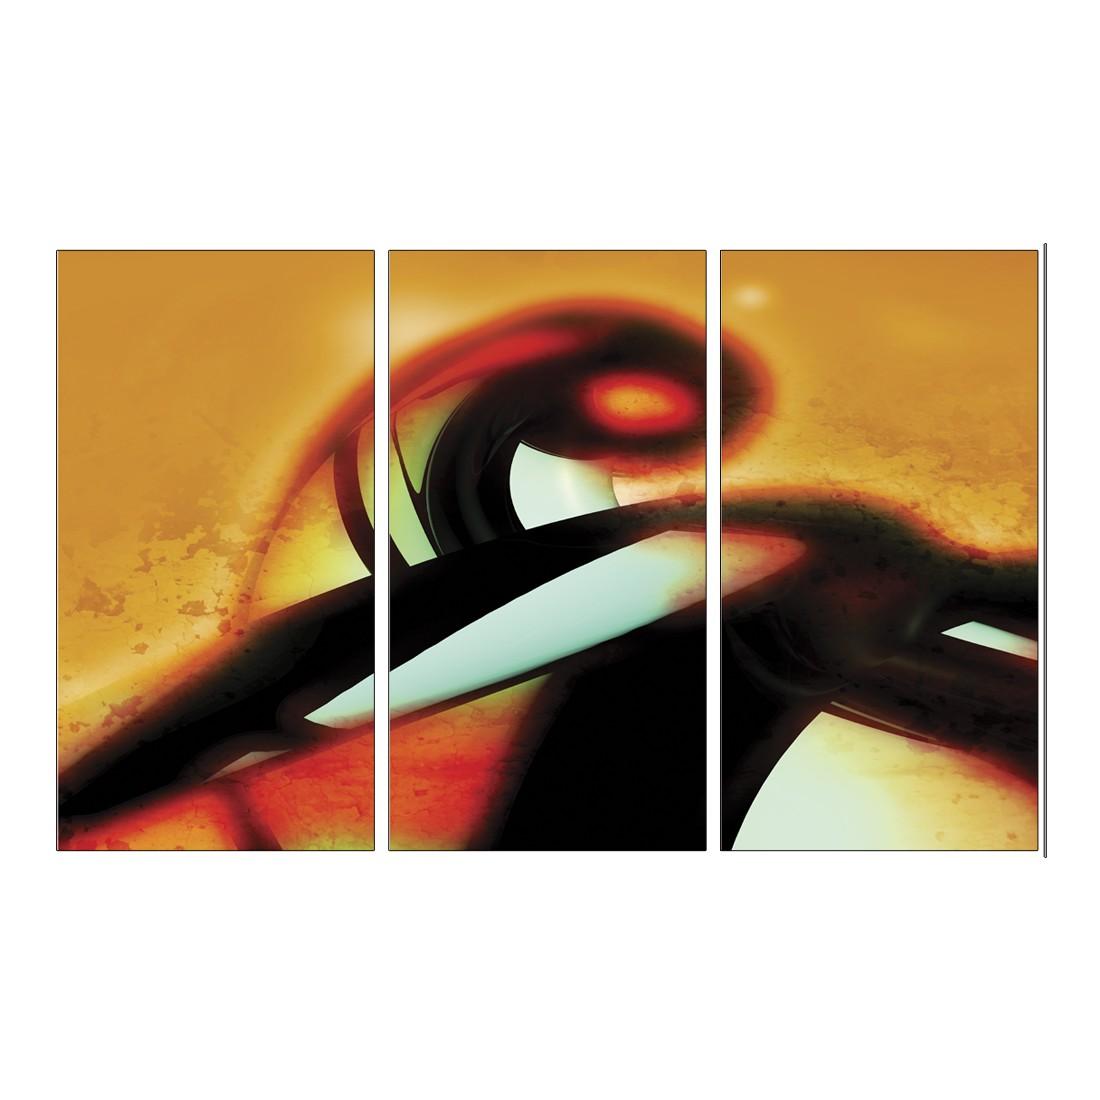 Leinwandbild Design – 120 x 80cm, Gallery of Innovative Art günstig online kaufen